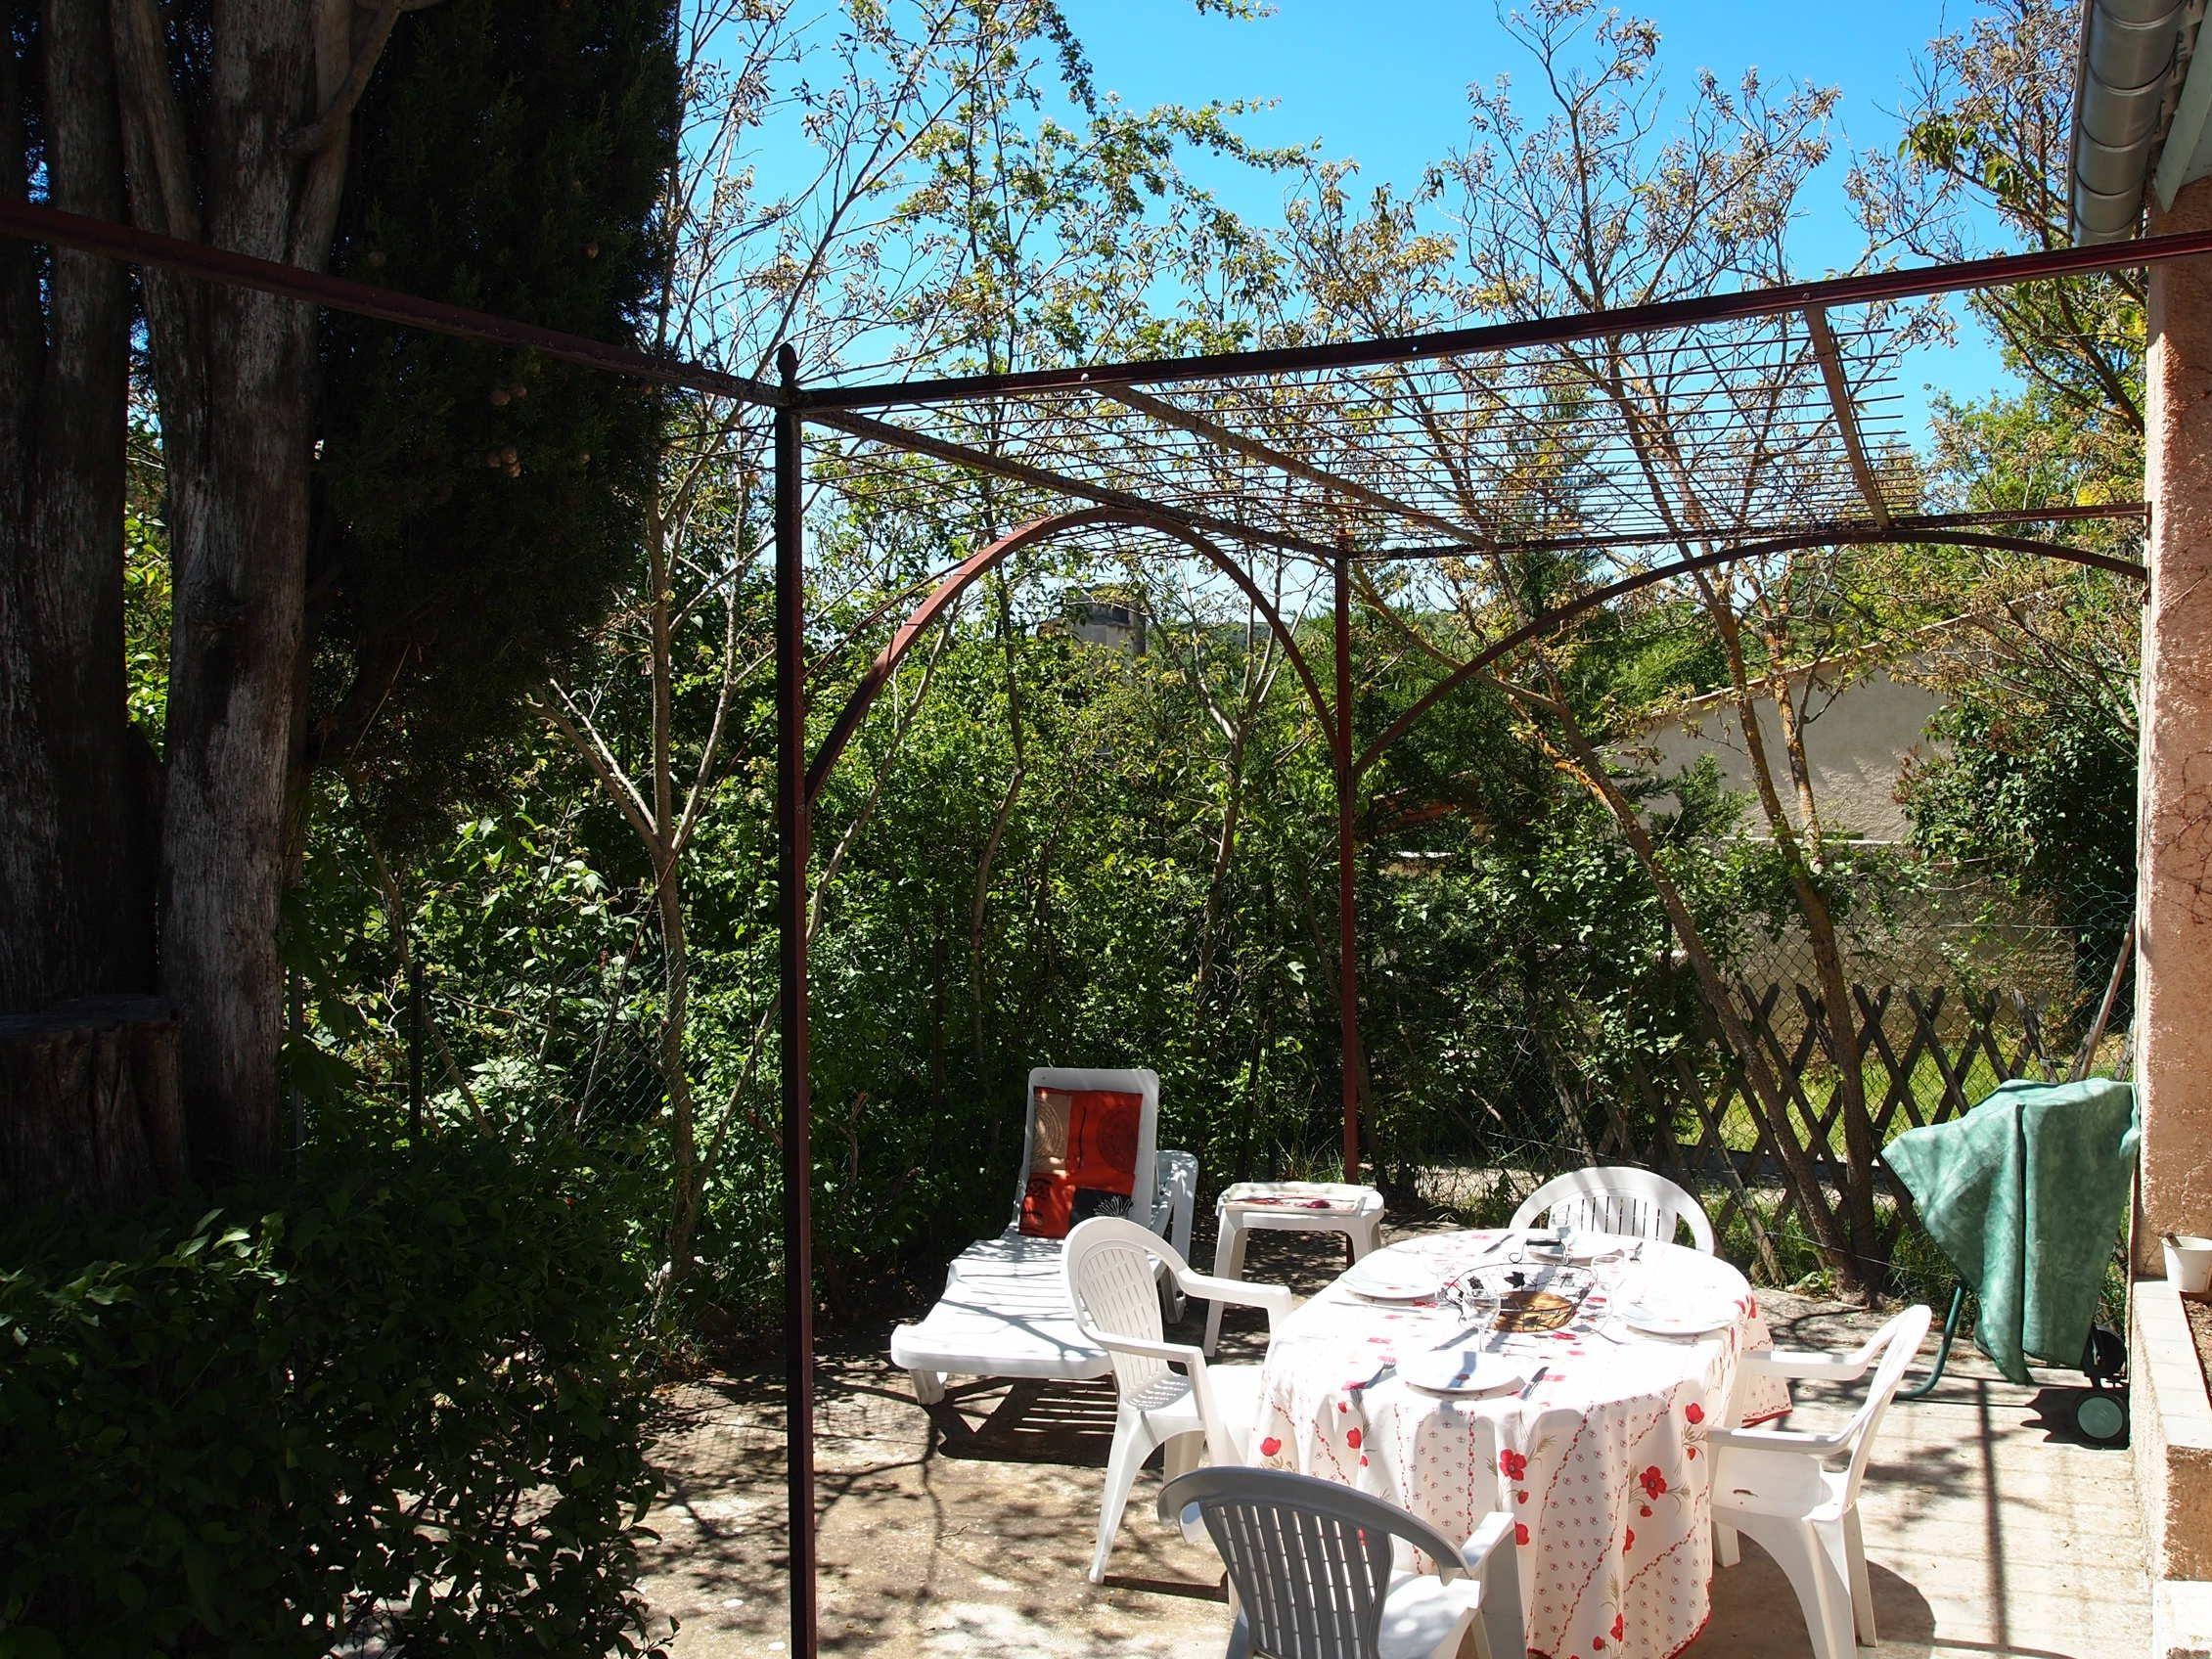 Camping Camping Rose de Provence Riez